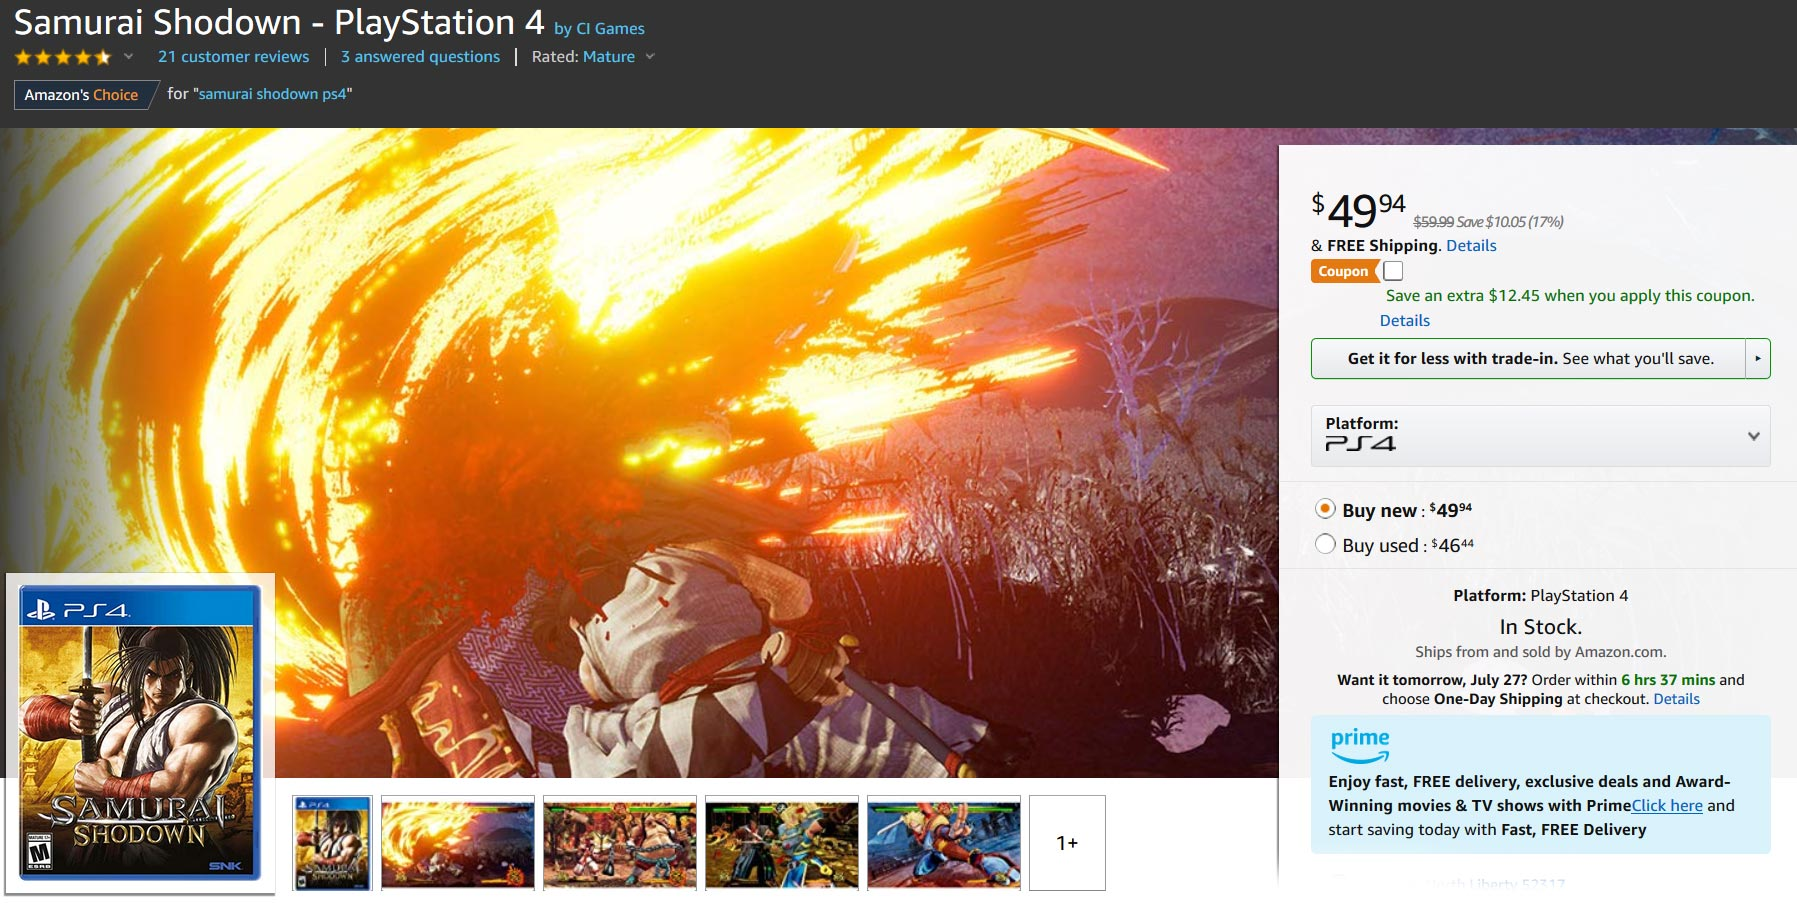 Samurai Shodown Amazon 3 out of 3 image gallery